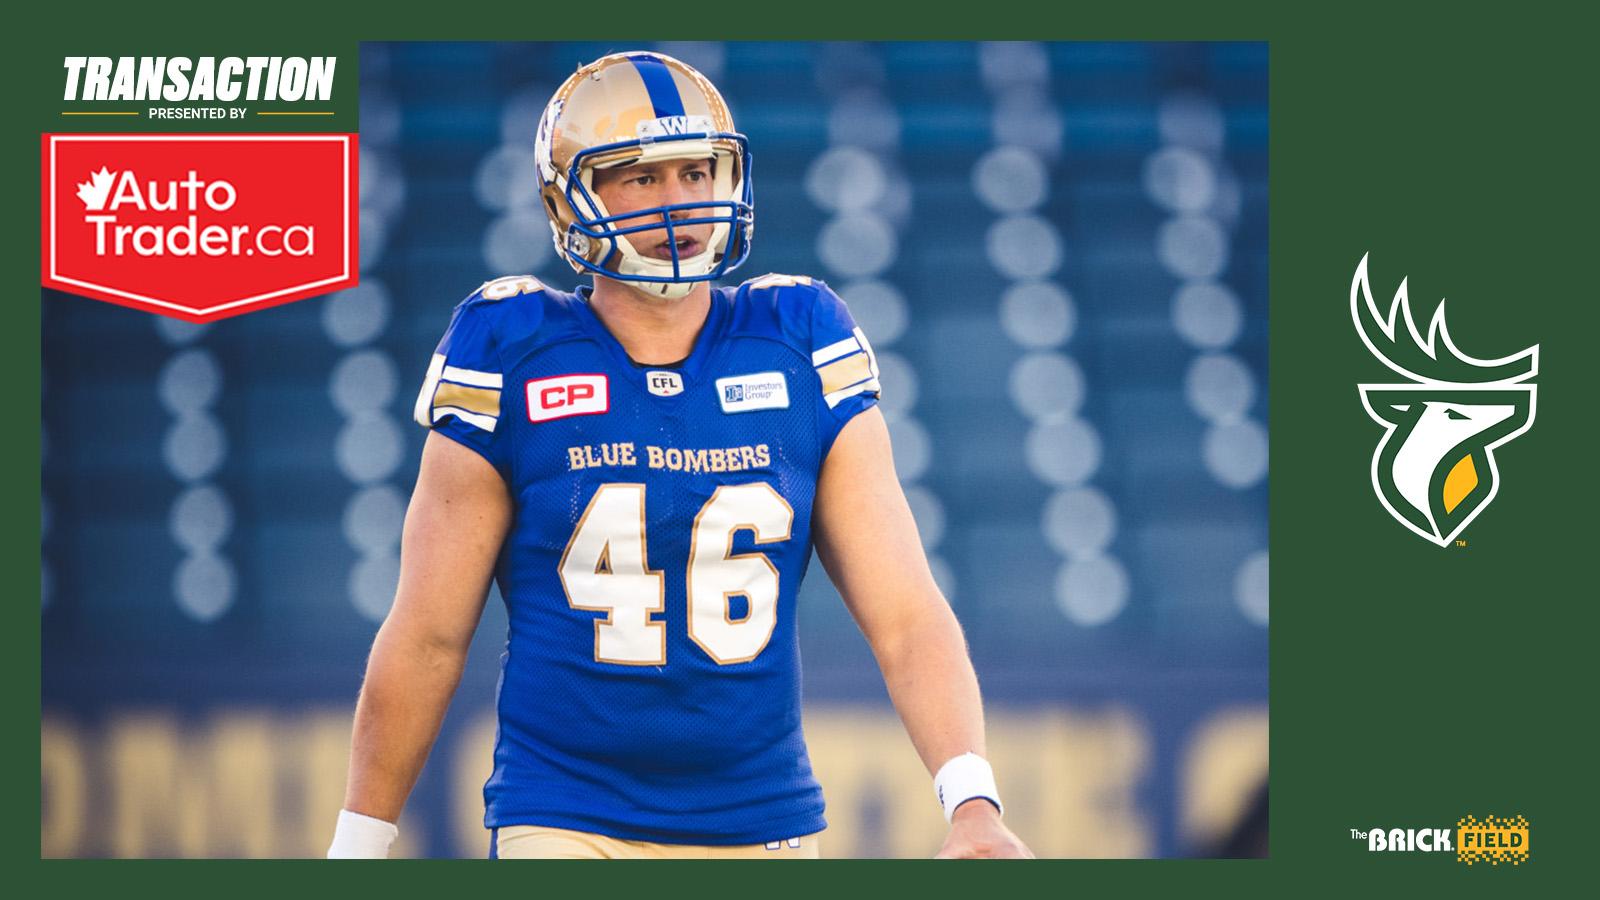 Edmonton Elks sign veteran long snapper Chad Rempel, release Greenberg